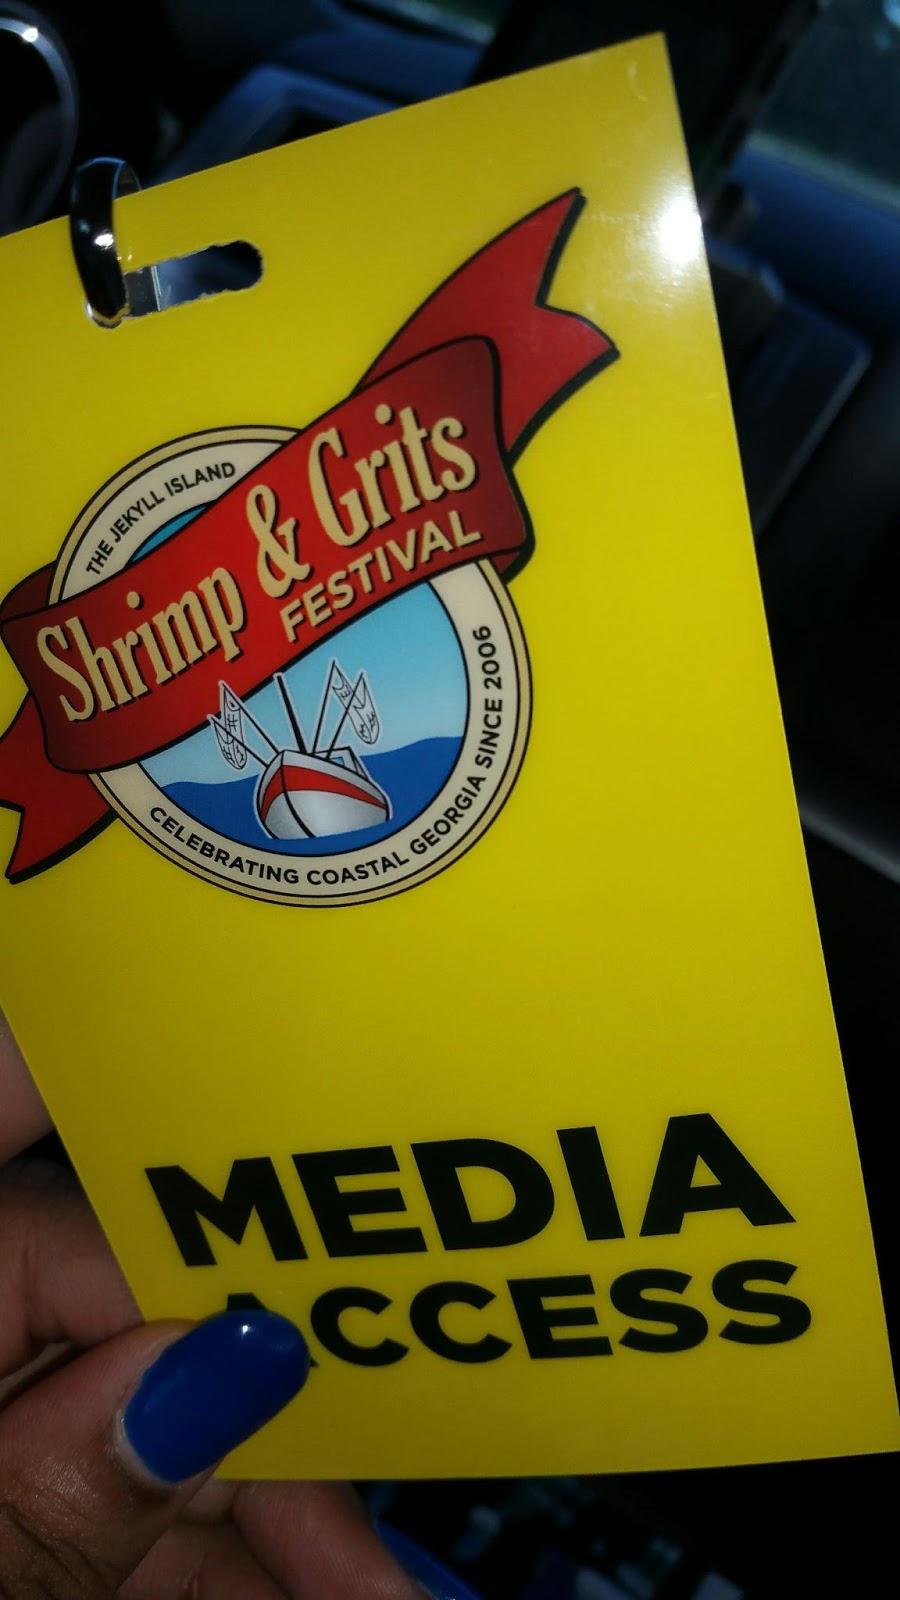 Shrimp and Grits 2015 Jekyll Island